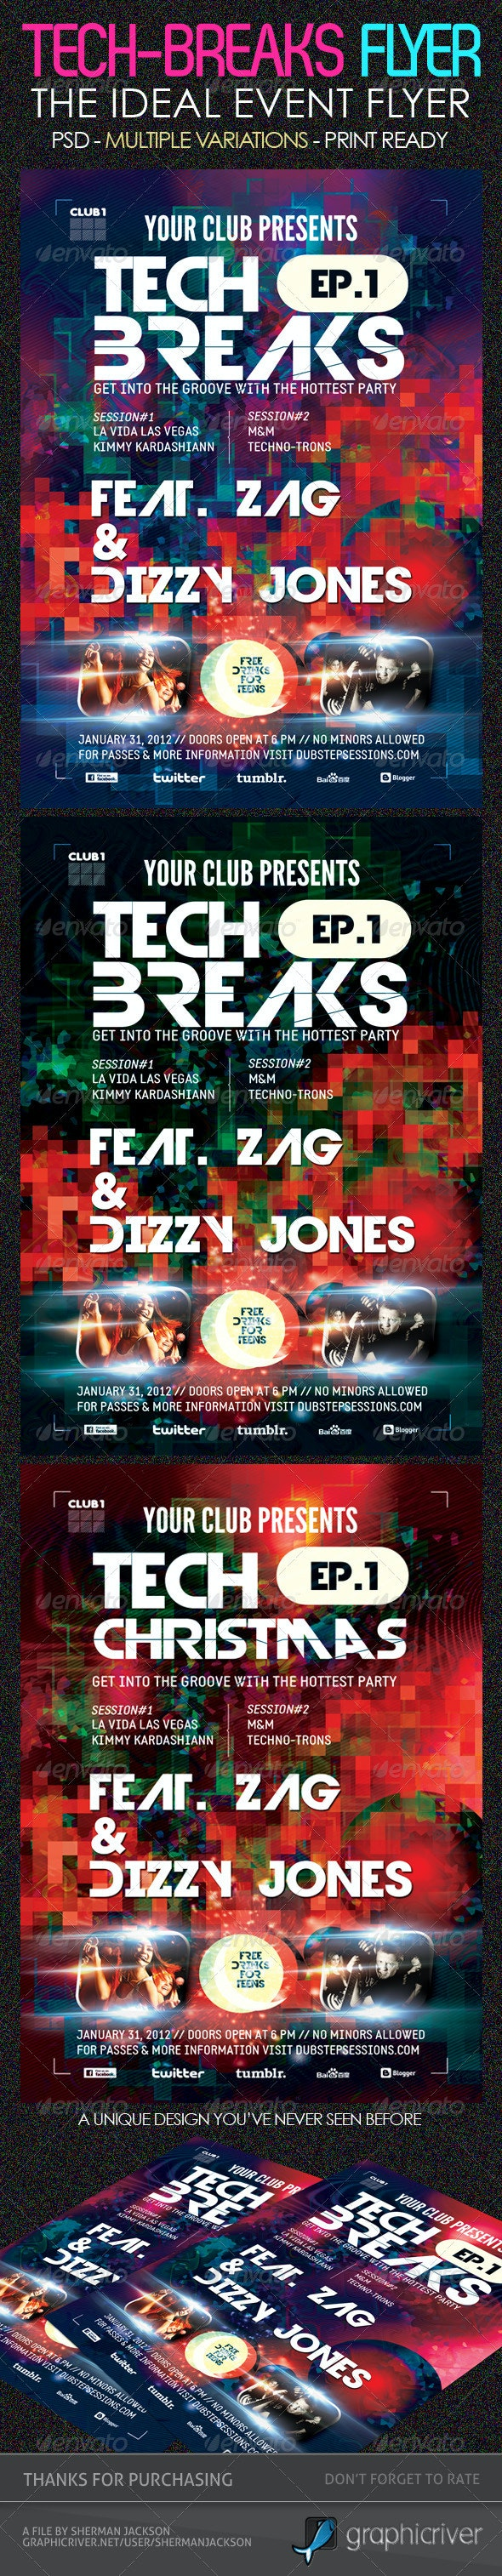 Tech Breaks Flyer Template - Clubs & Parties Events